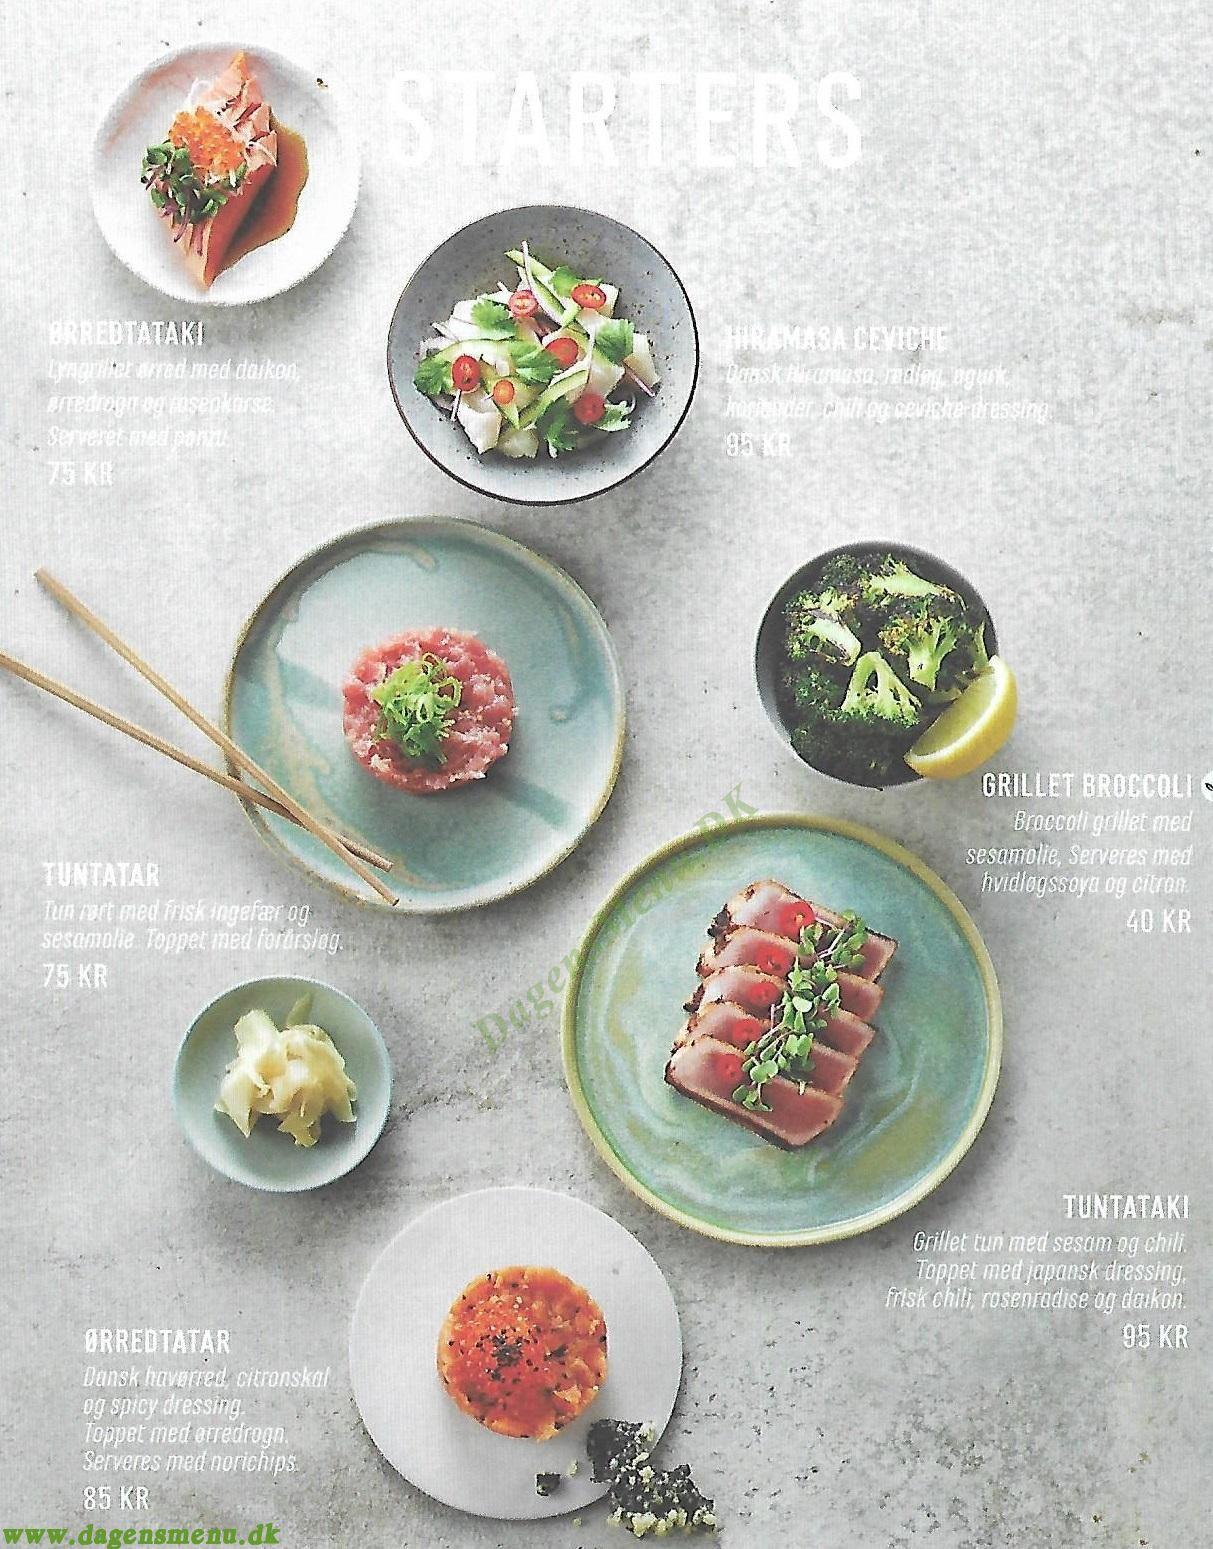 Letz Sushi Nørrebro - Menukort